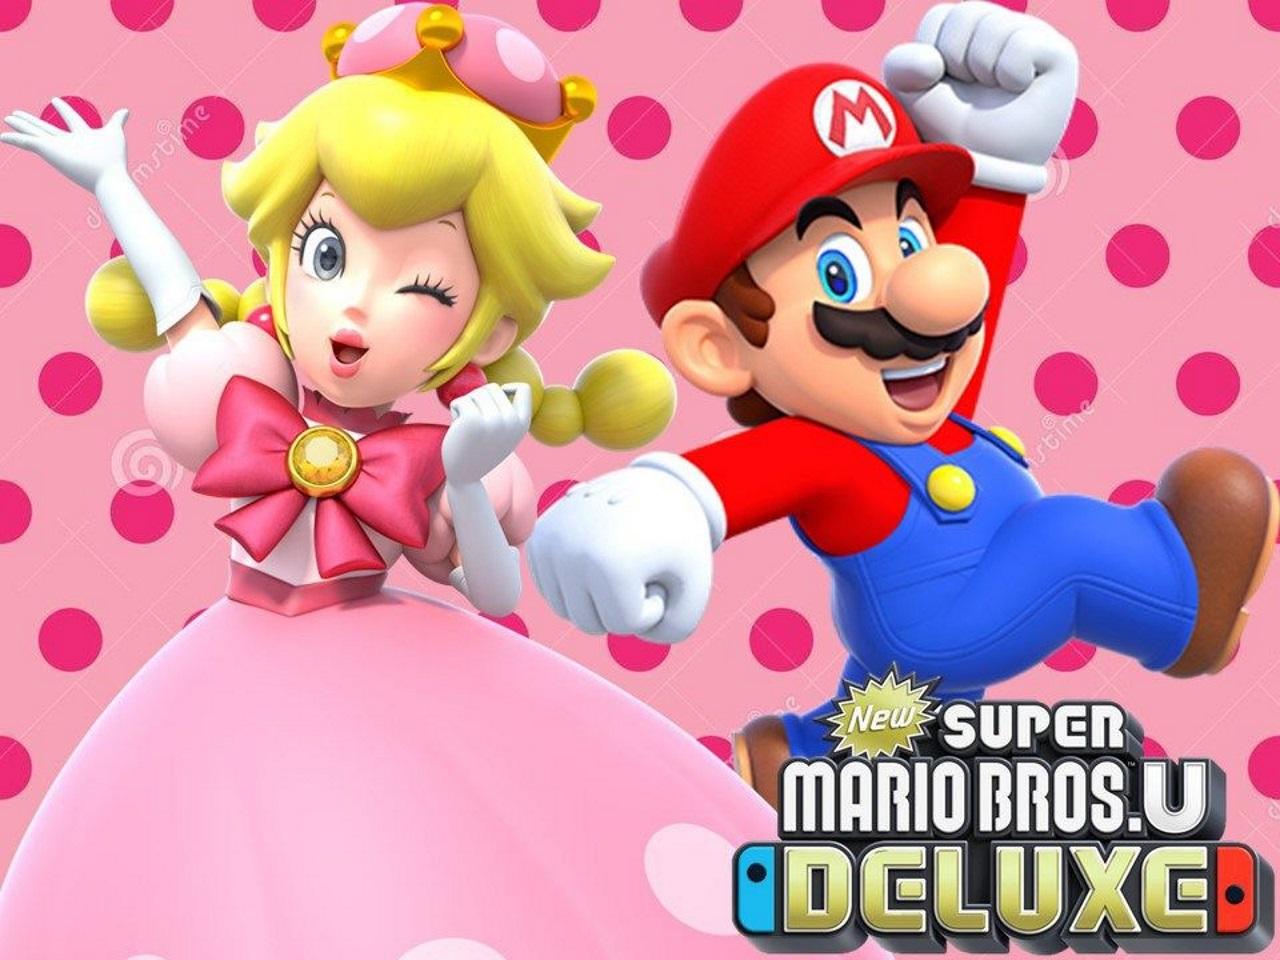 New Super Mario Bros U Deluxe Mostrati 15 Minuti Di Gameplay Del